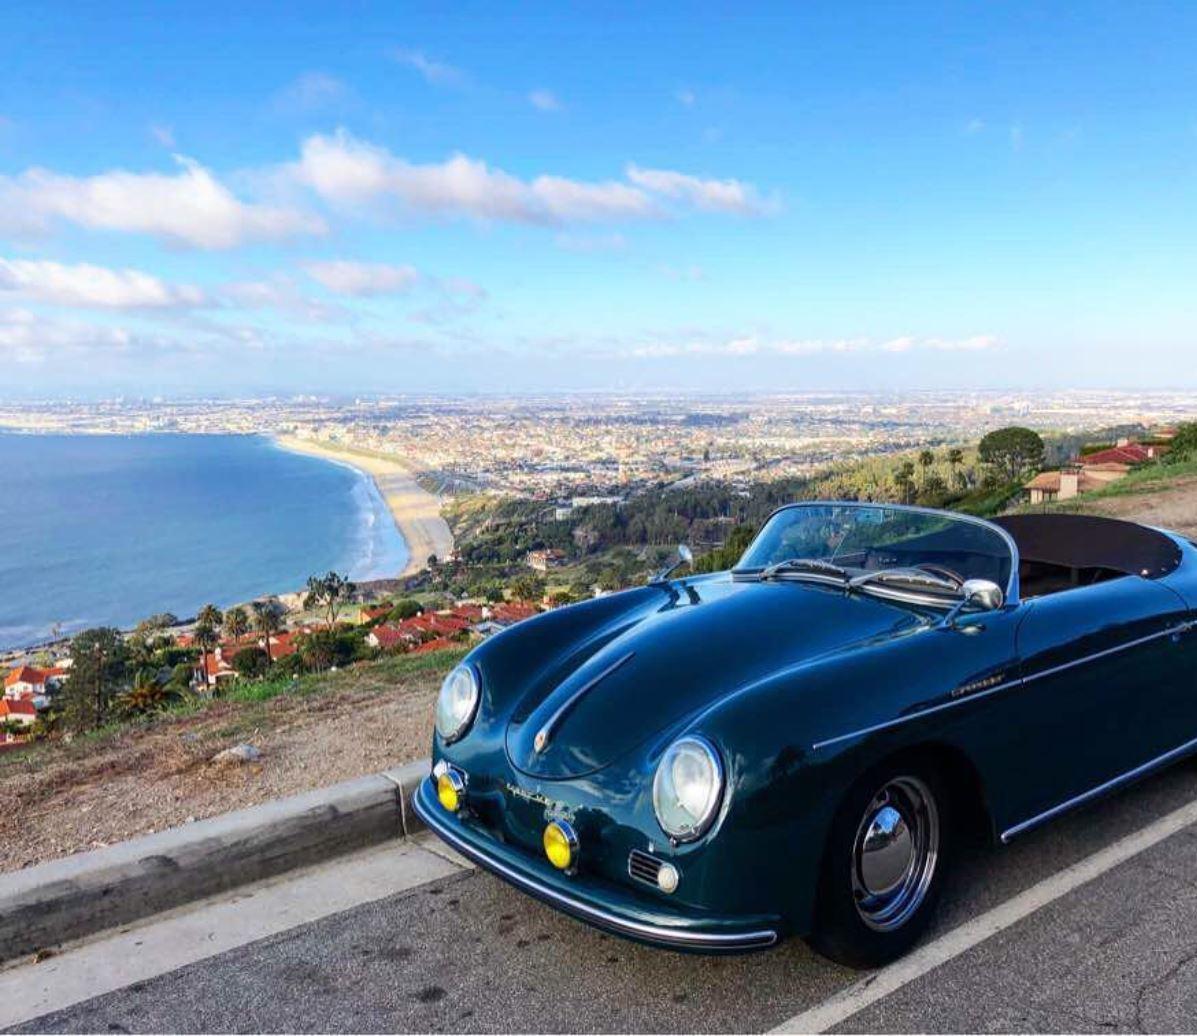 Copy of 19'56 Porsche 356 Speedster Tribute in Palos Verdes